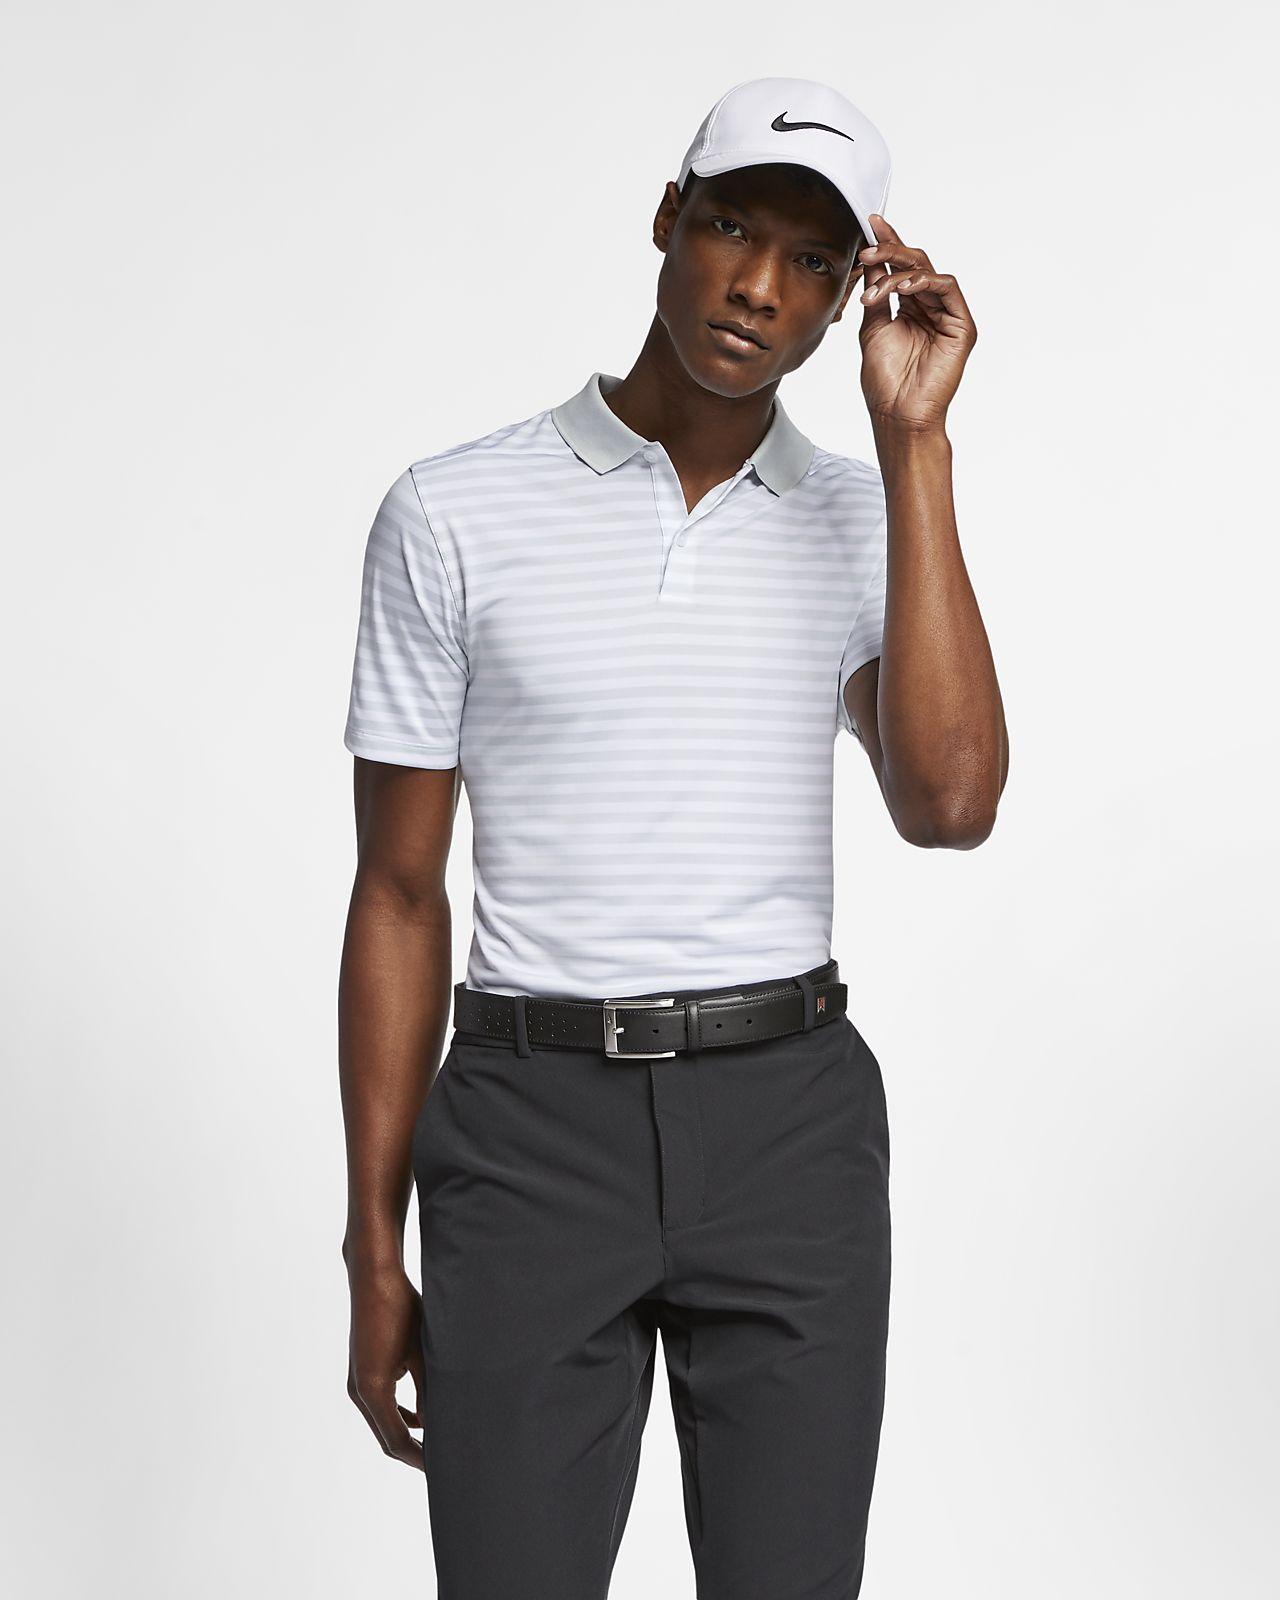 6b53dd77b192c Nike Dri-FIT Victory Men s Striped Golf Polo. Nike.com GB